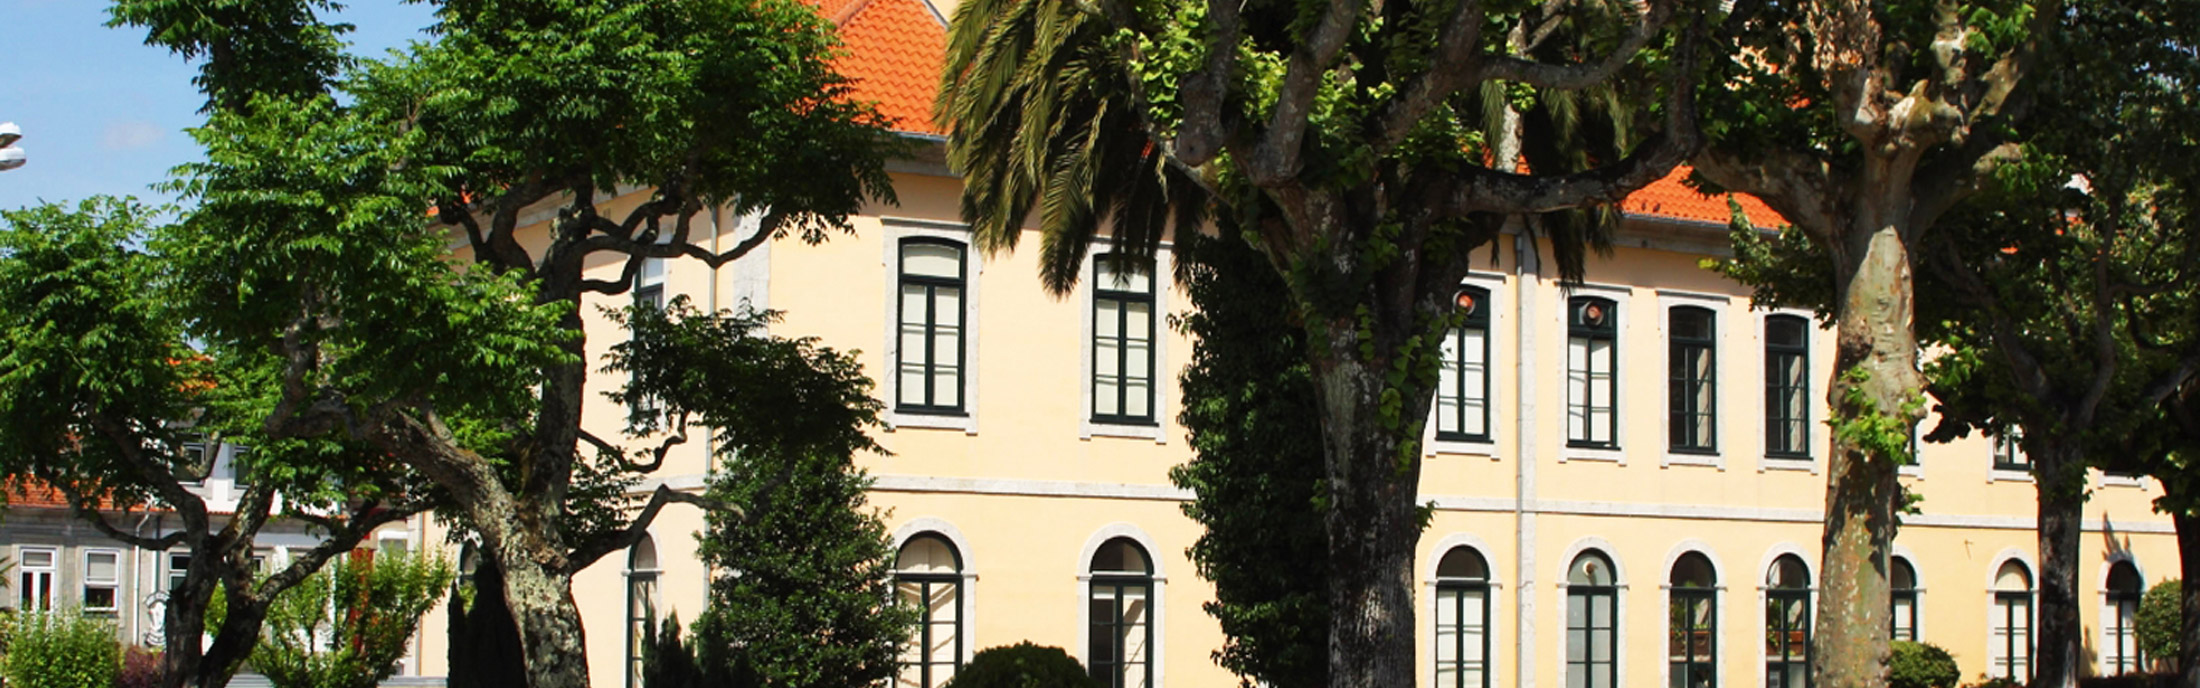 Portal do Associativismo - Município de Gondomar